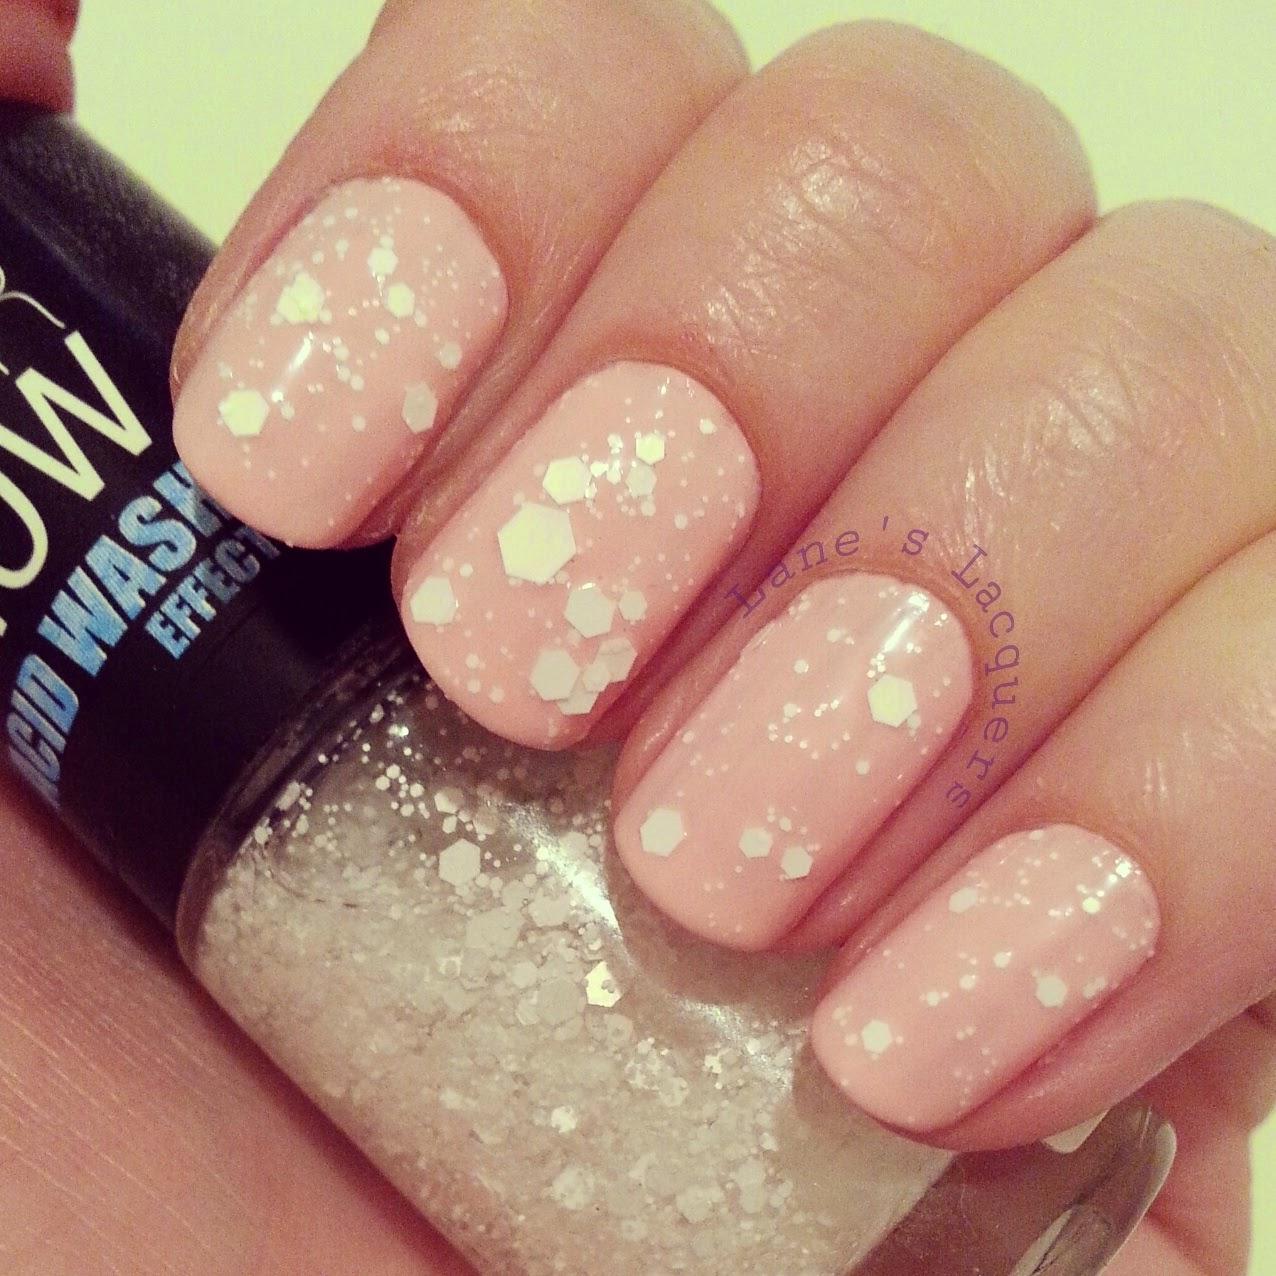 maybelline-colorshow-acid-wash-top-splatter-swatch-manicure (2)